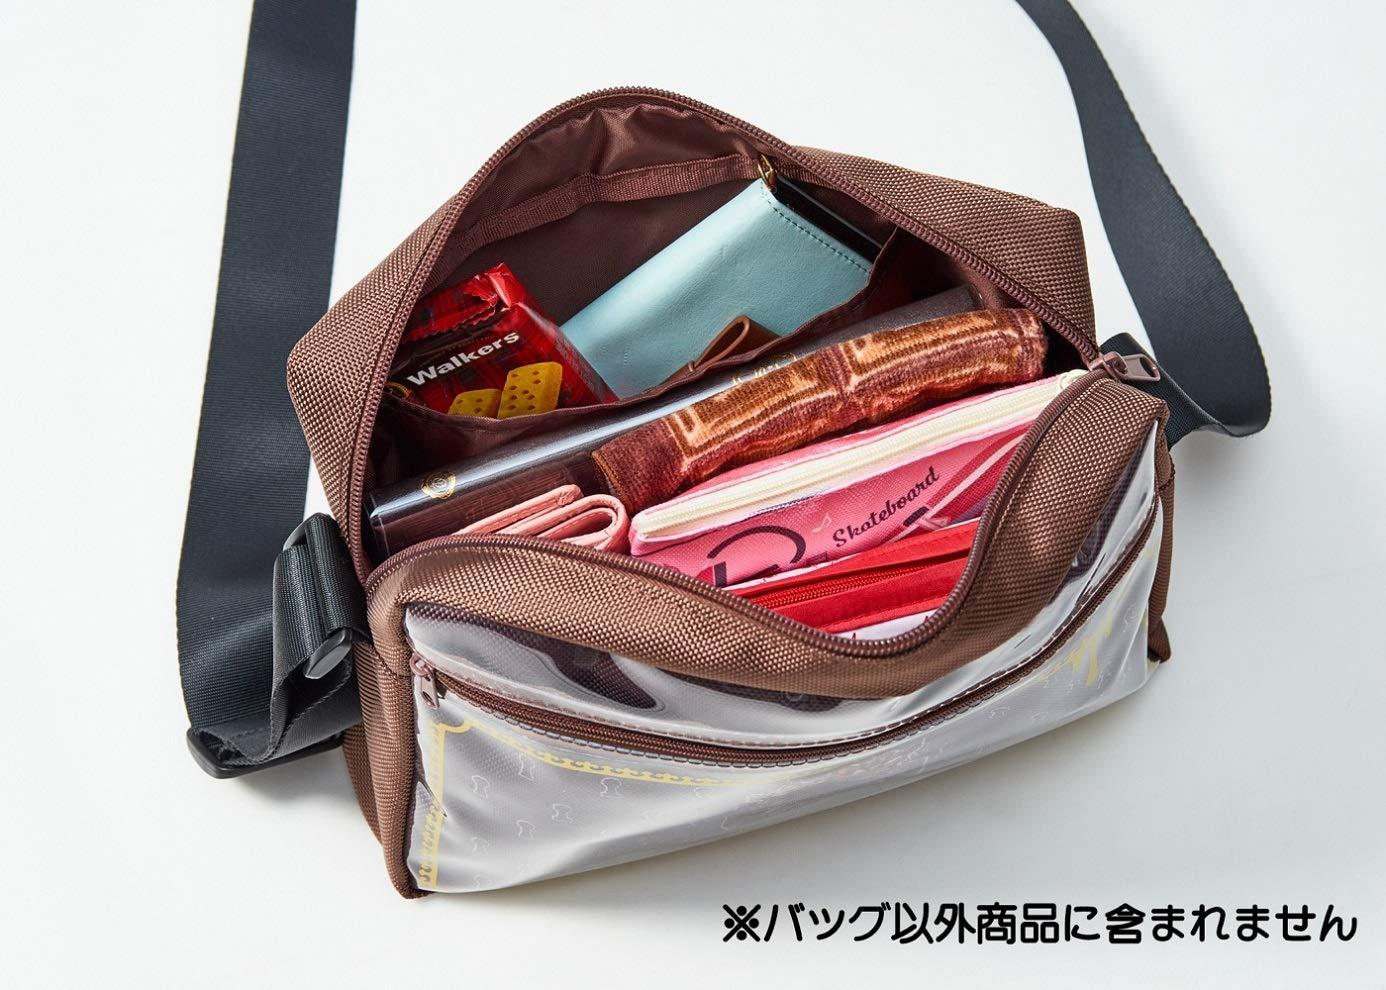 Sweets Vampire Bag Book DHL Delivery New Uta no Prince-sama ×Q-pot